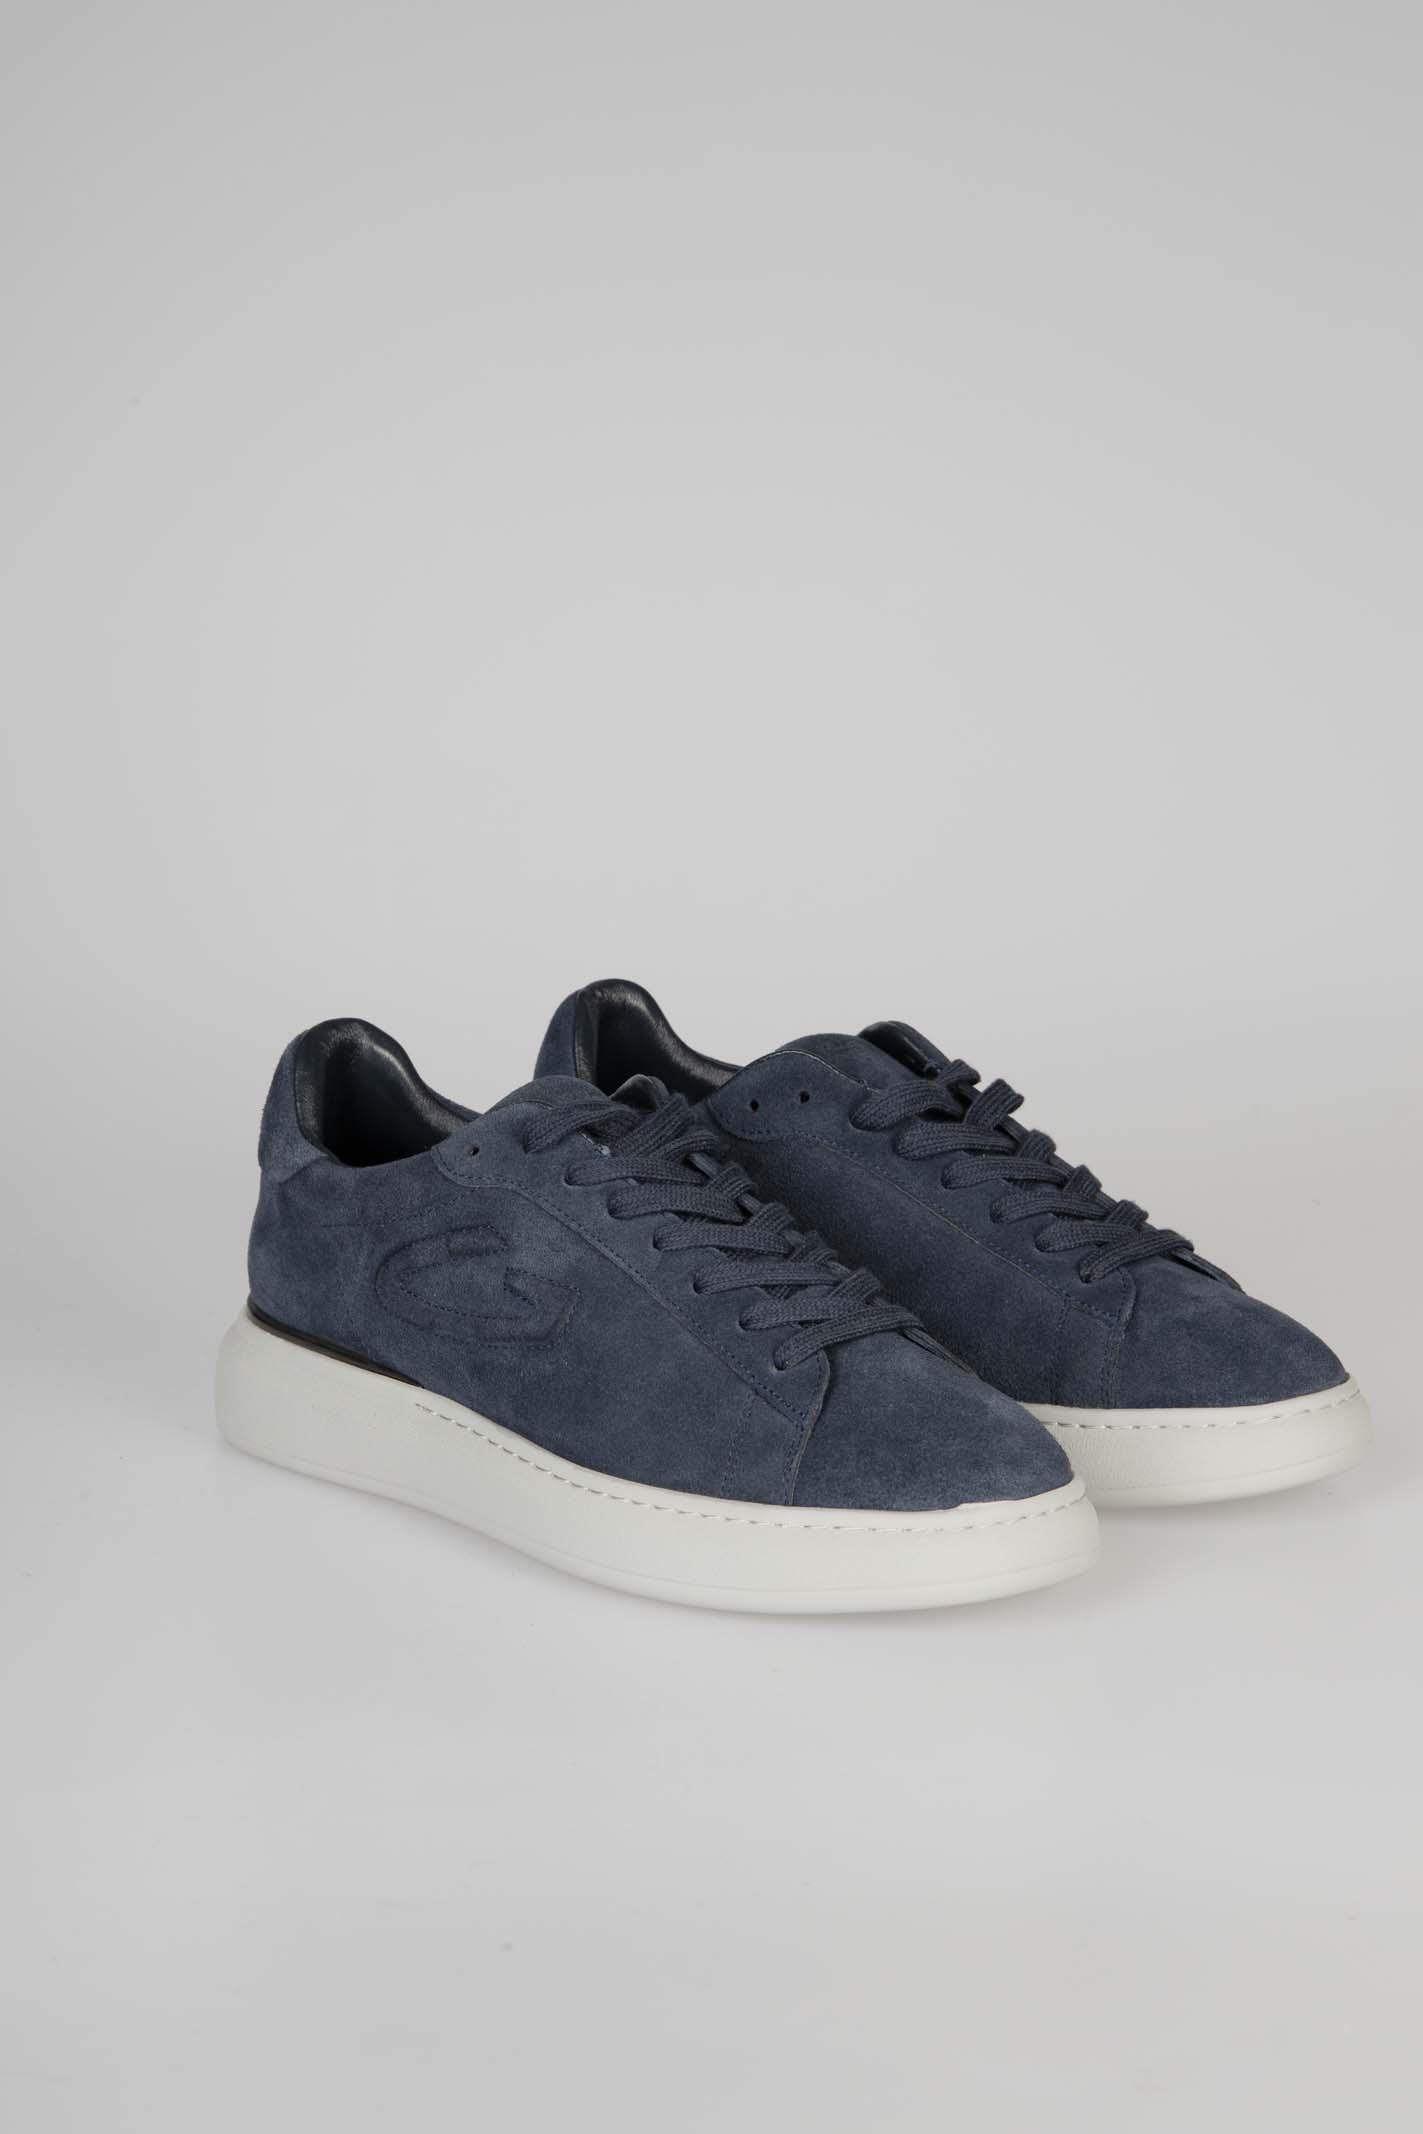 Sneakers King 0037 ALBERTO GUARDIANI | Sneakers | AGM003705Navy